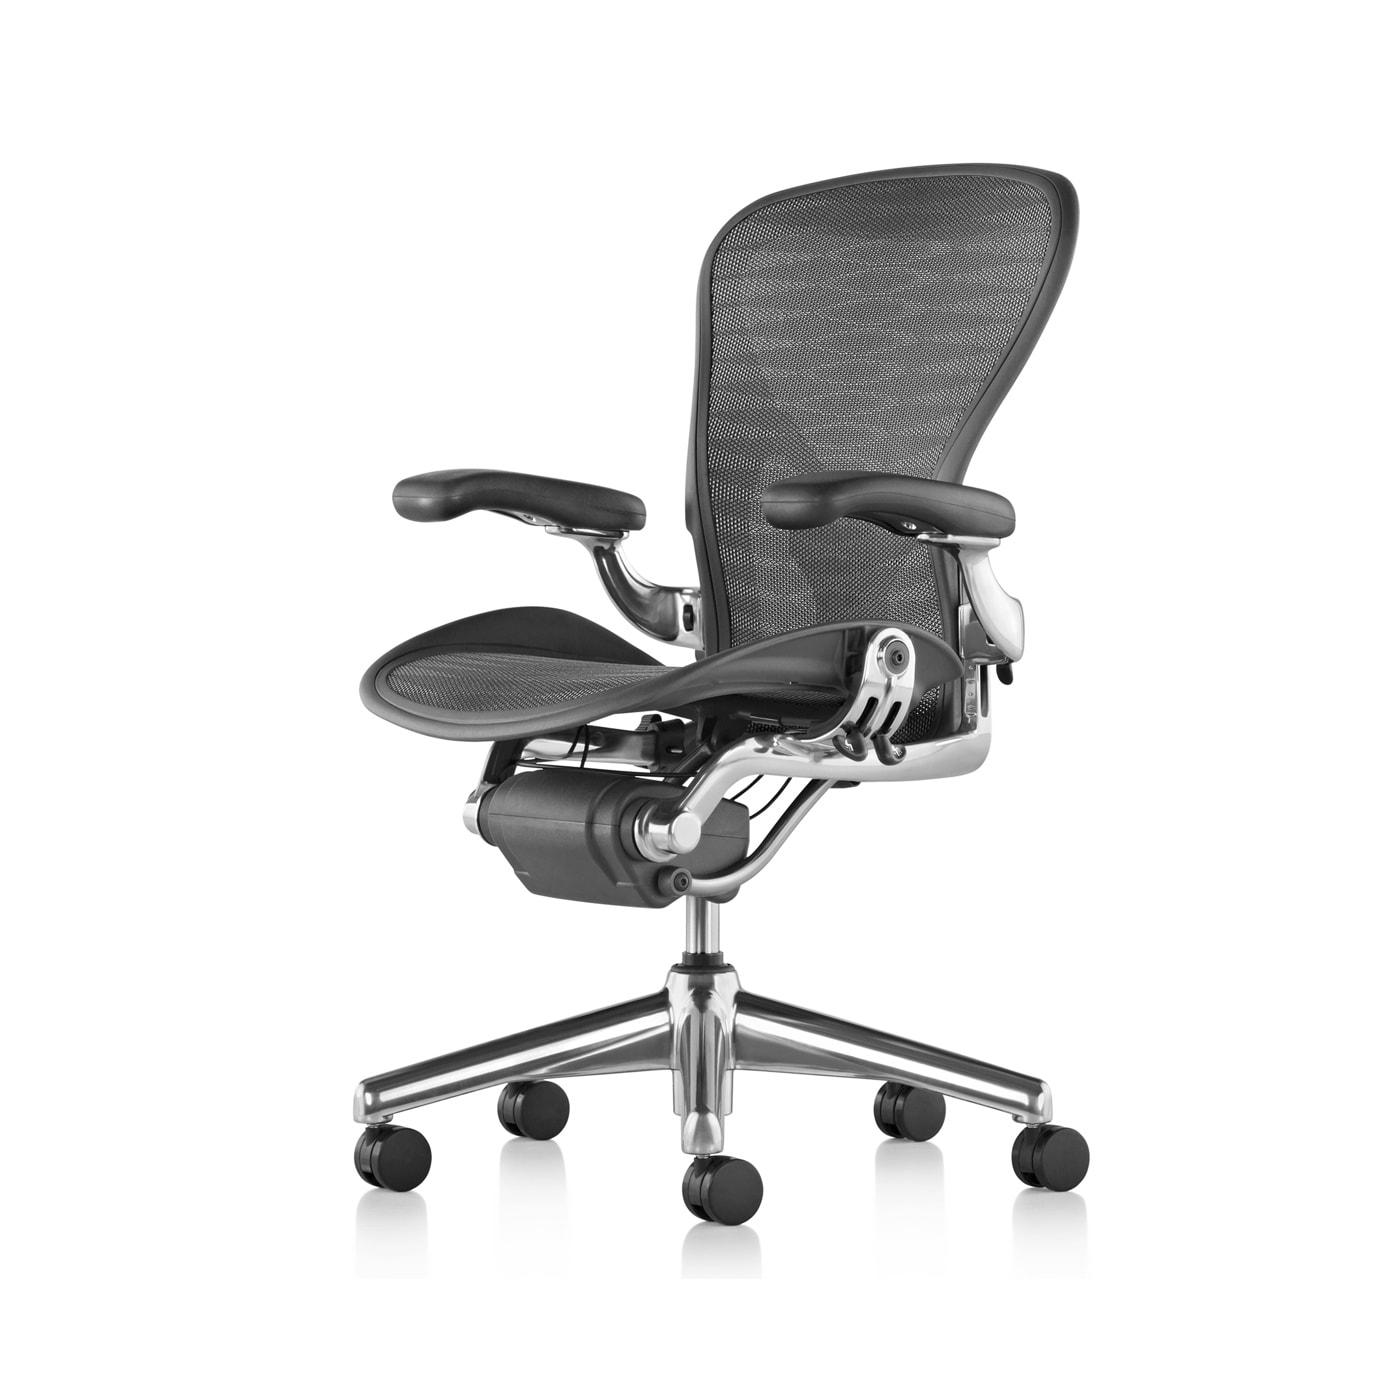 Herman Miller Aeron Classic sedia ufficio full optional - vendita online